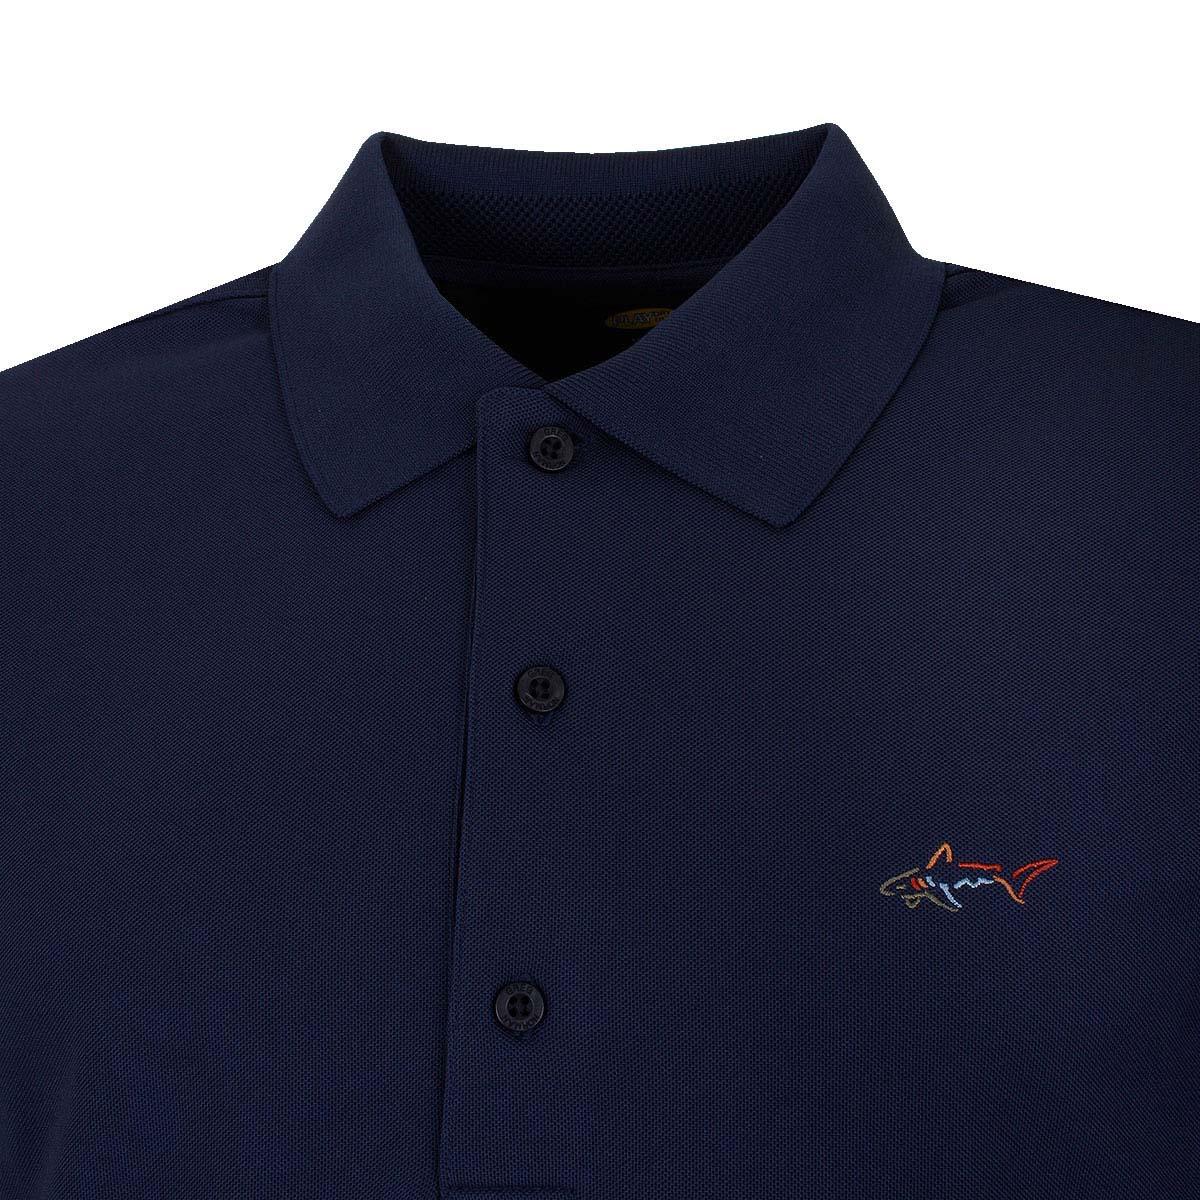 Greg-Norman-Mens-KX04-Performance-Micro-Pique-Golf-Polo-Shirt-28-OFF-RRP thumbnail 51